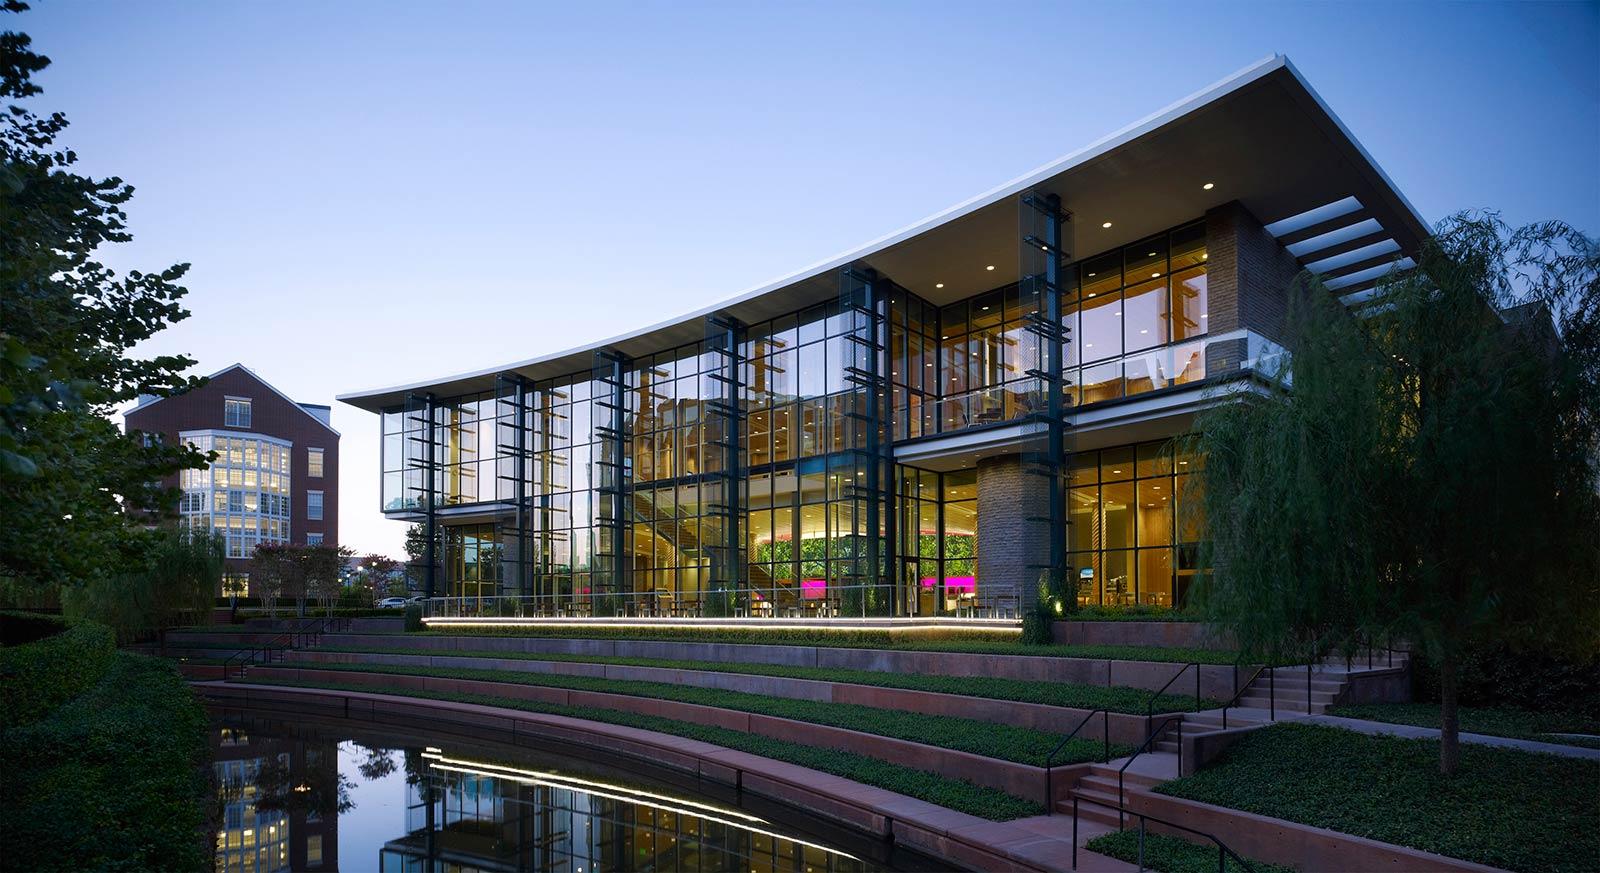 Knox Glass - Oklahoma city glazing and glass contractor